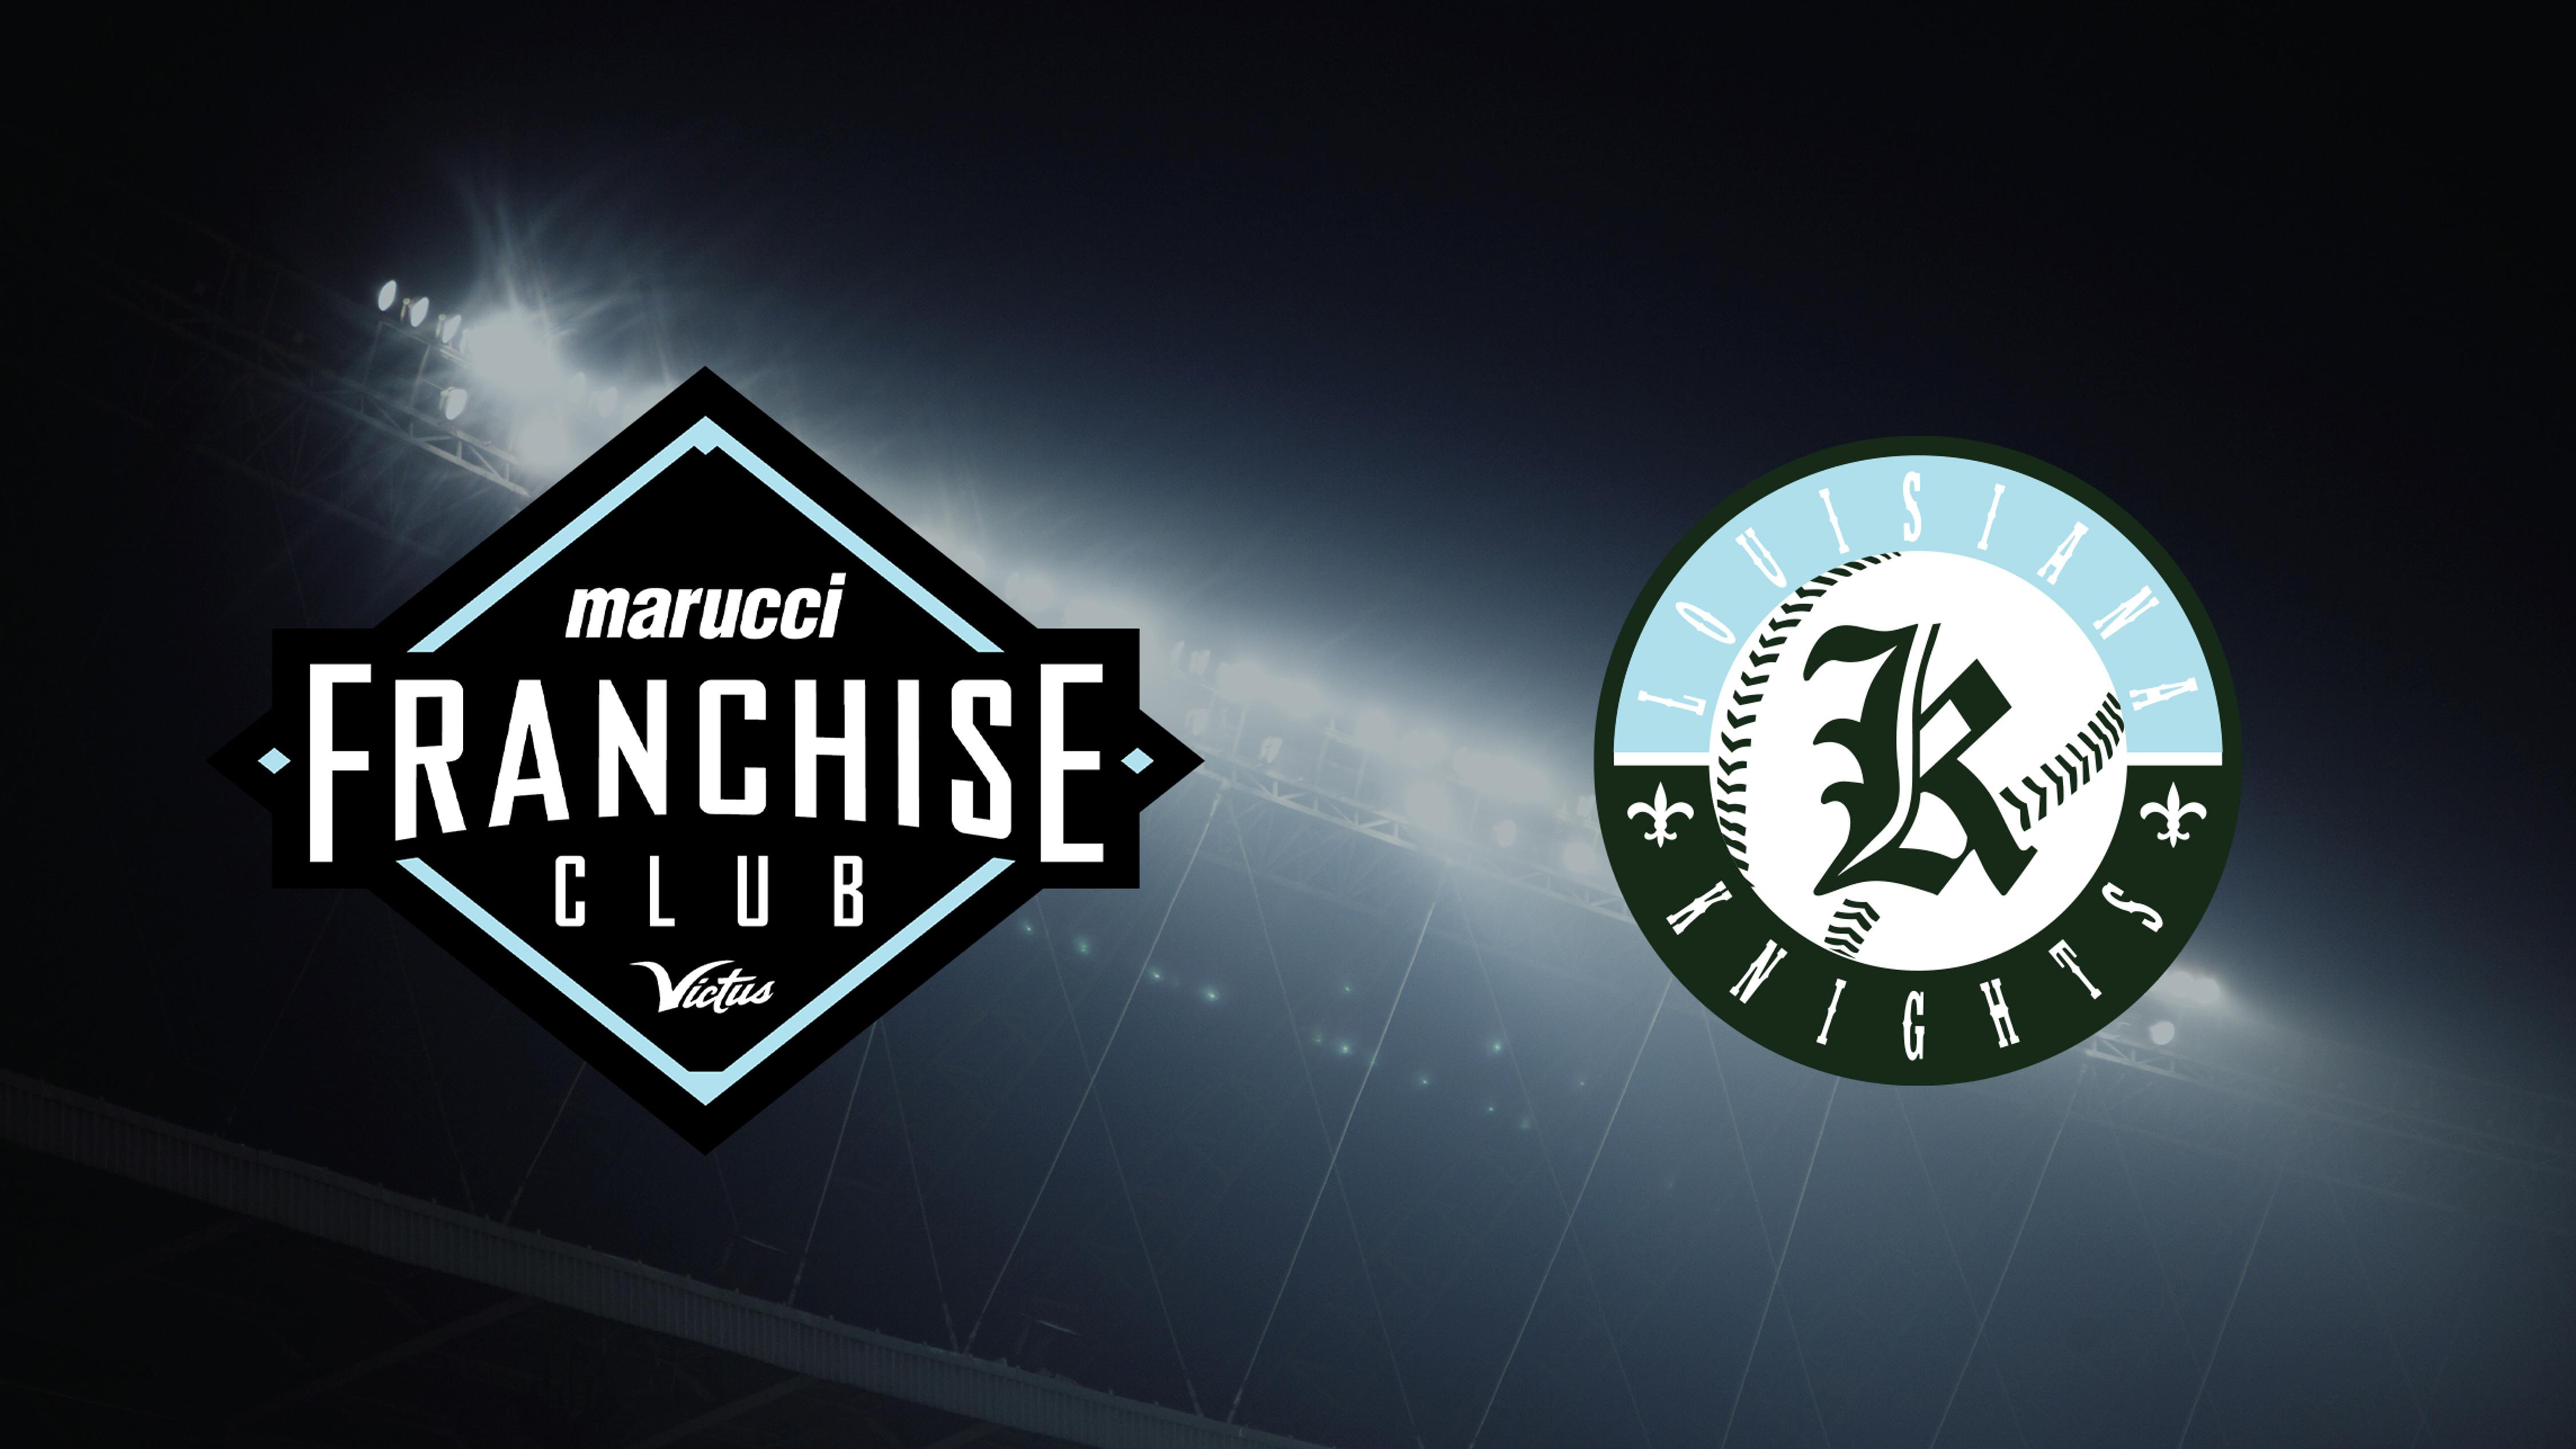 Elite Baseball Organization Extends Partnership With Local Louisiana Brand